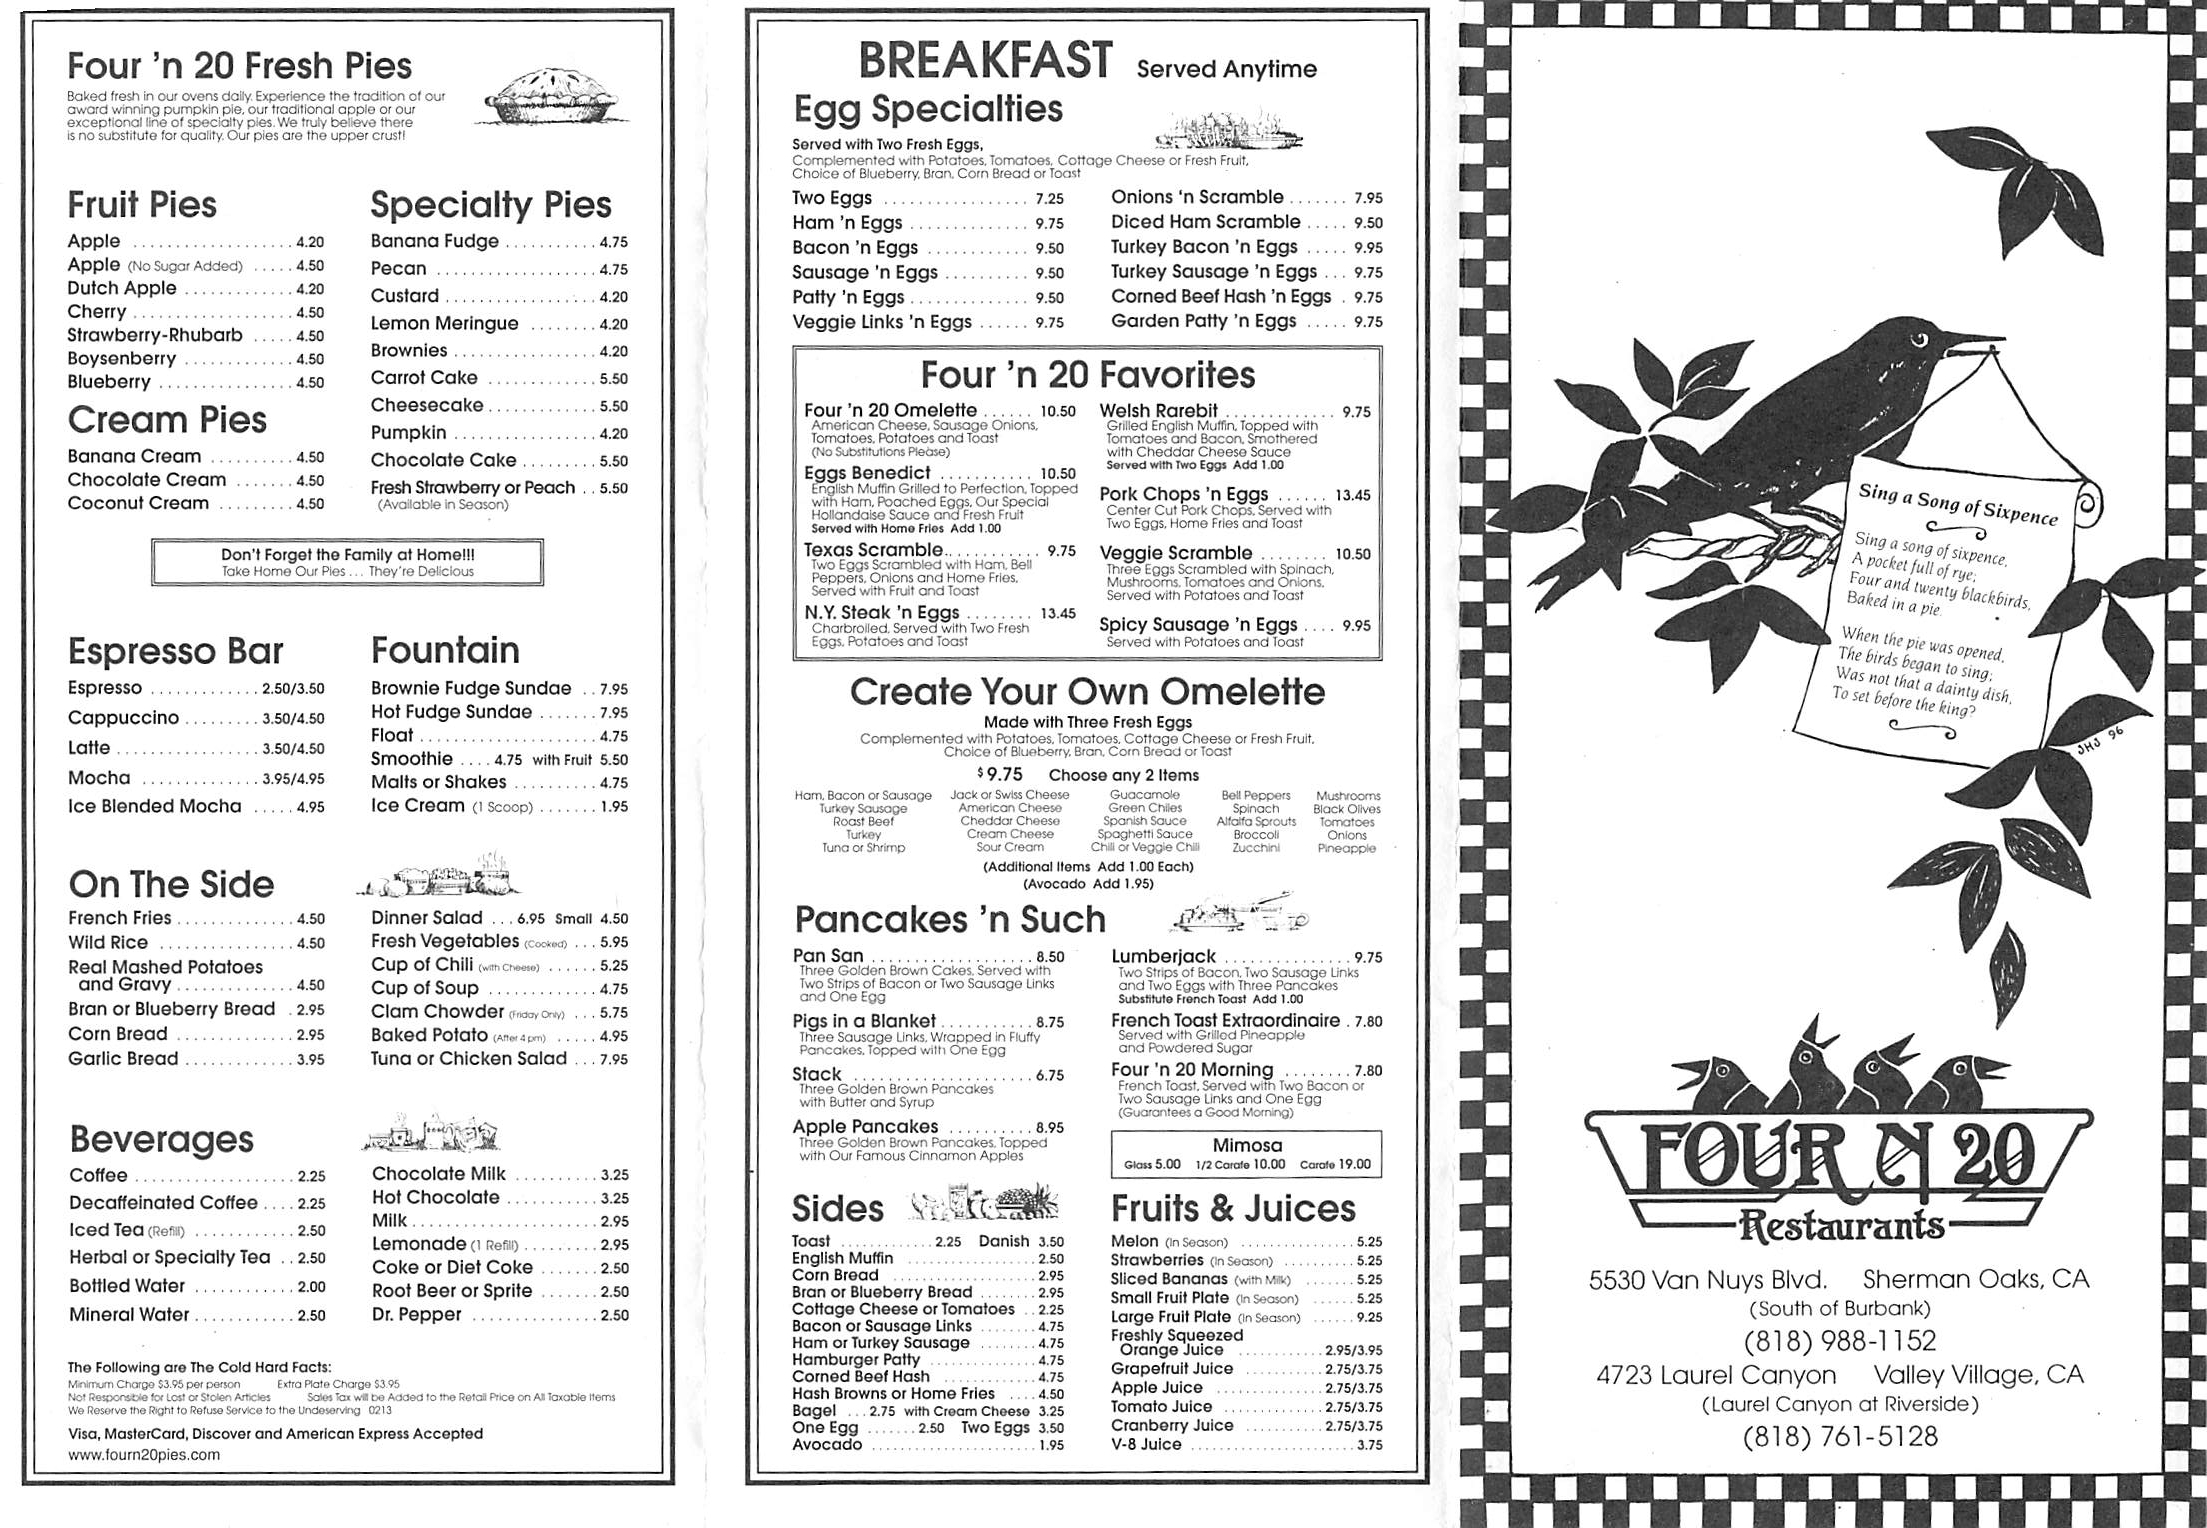 four-n-20-menu